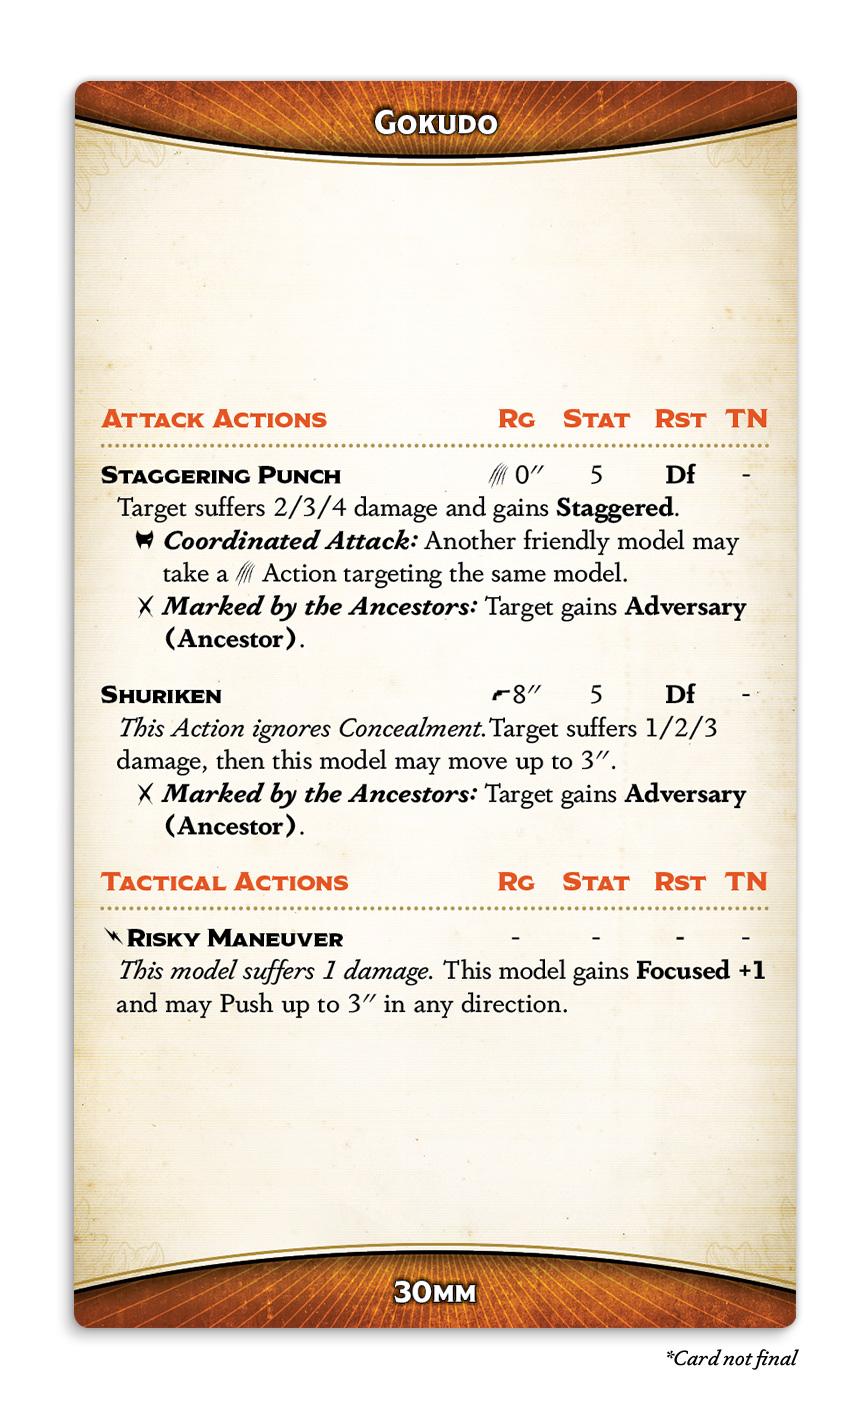 WaldosWeekly_0227_Gokudo_Card-Back.jpg